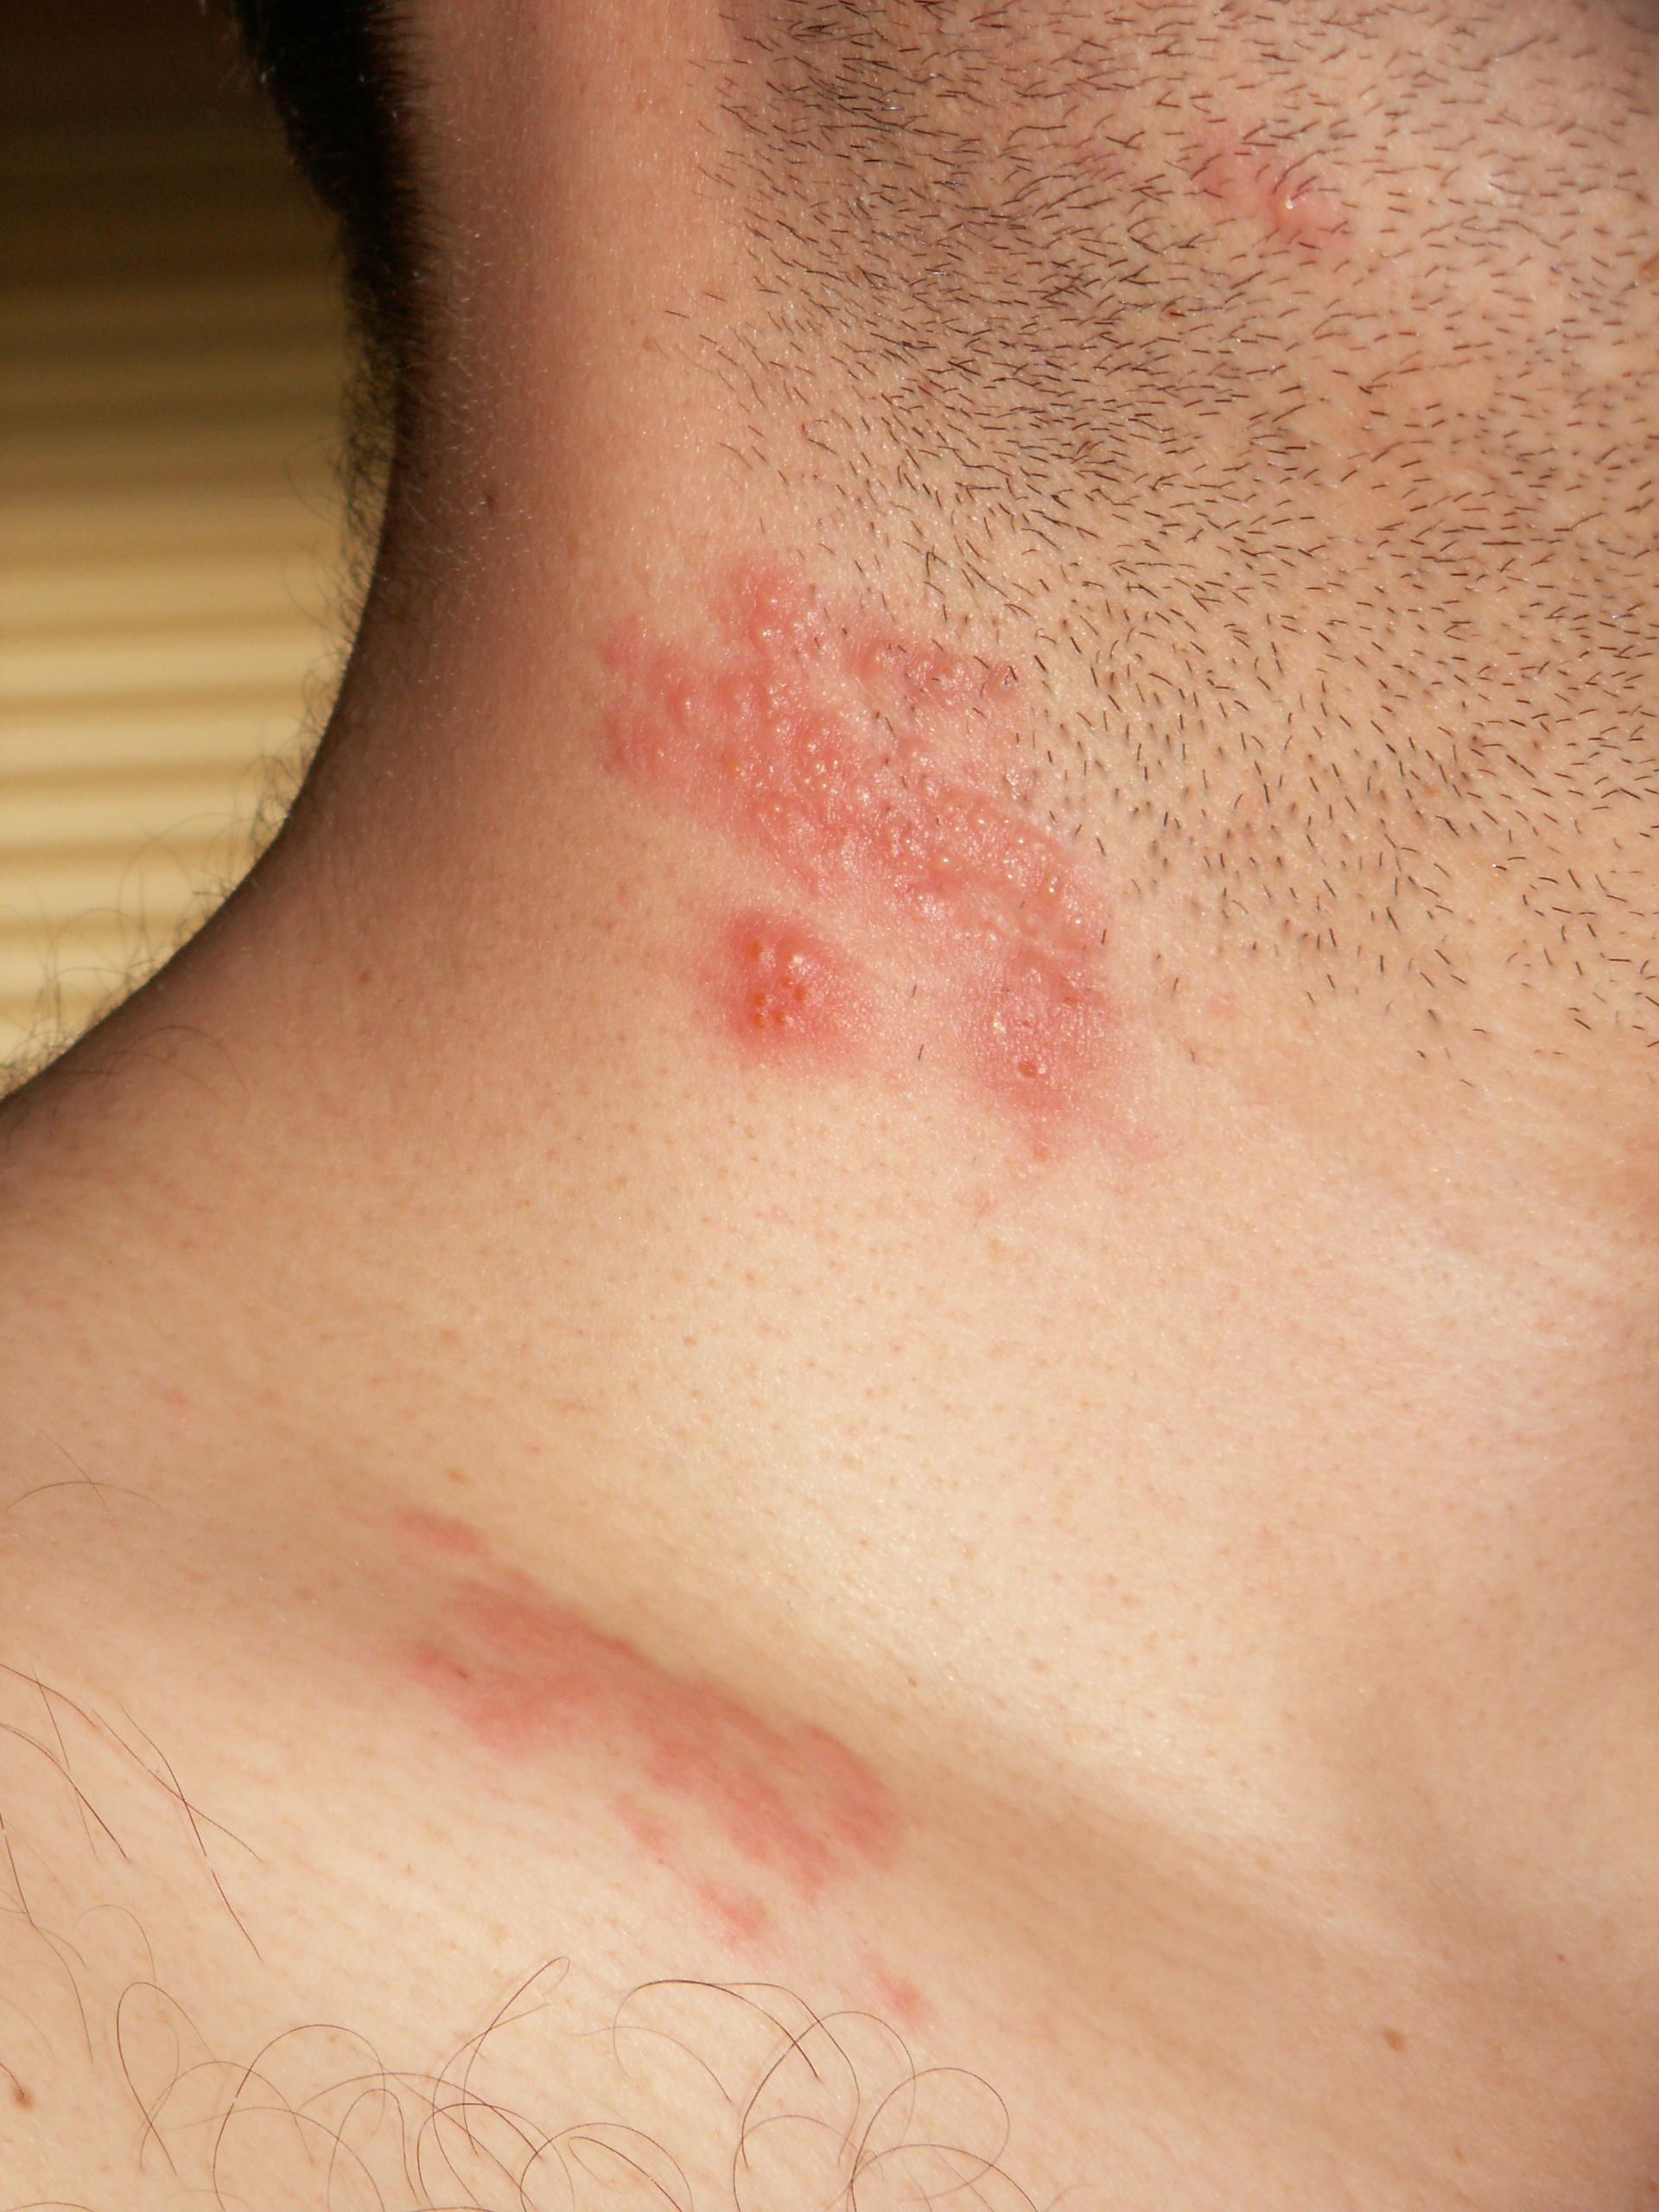 papillomavirus et douleur articulaire hpv impfung empfehlung manner